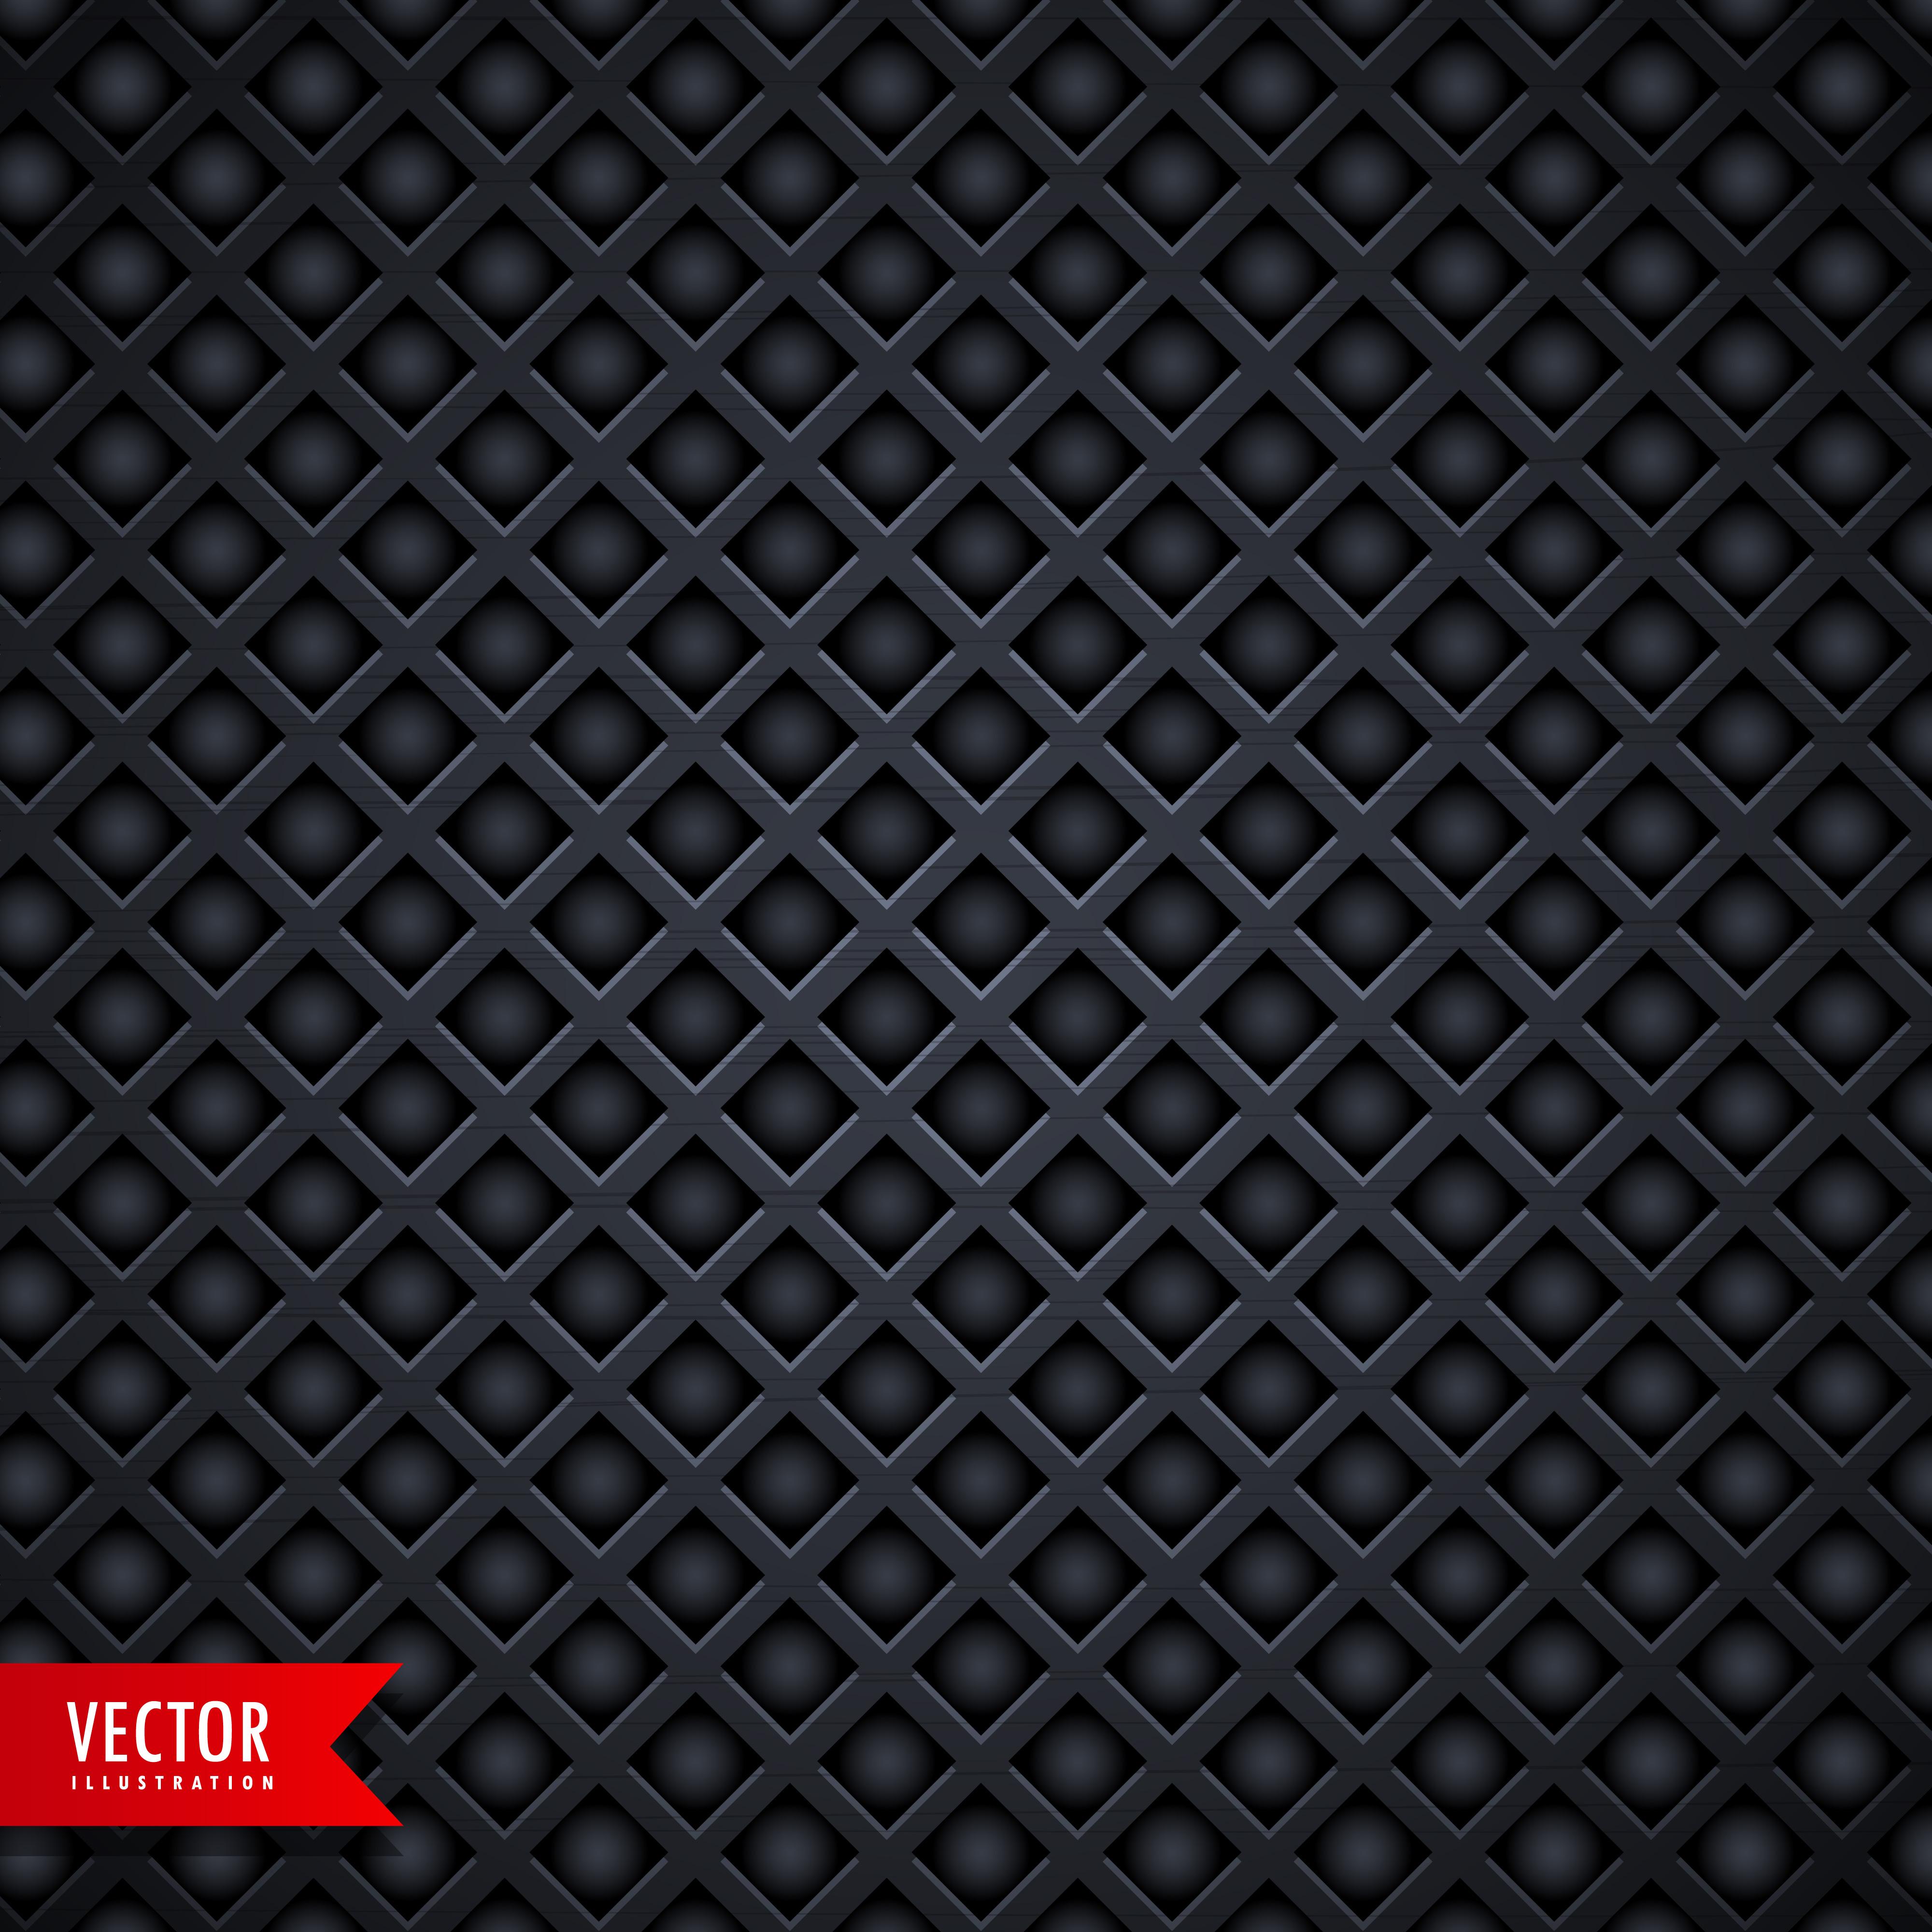 stylish metal texture dark background with diamond shape